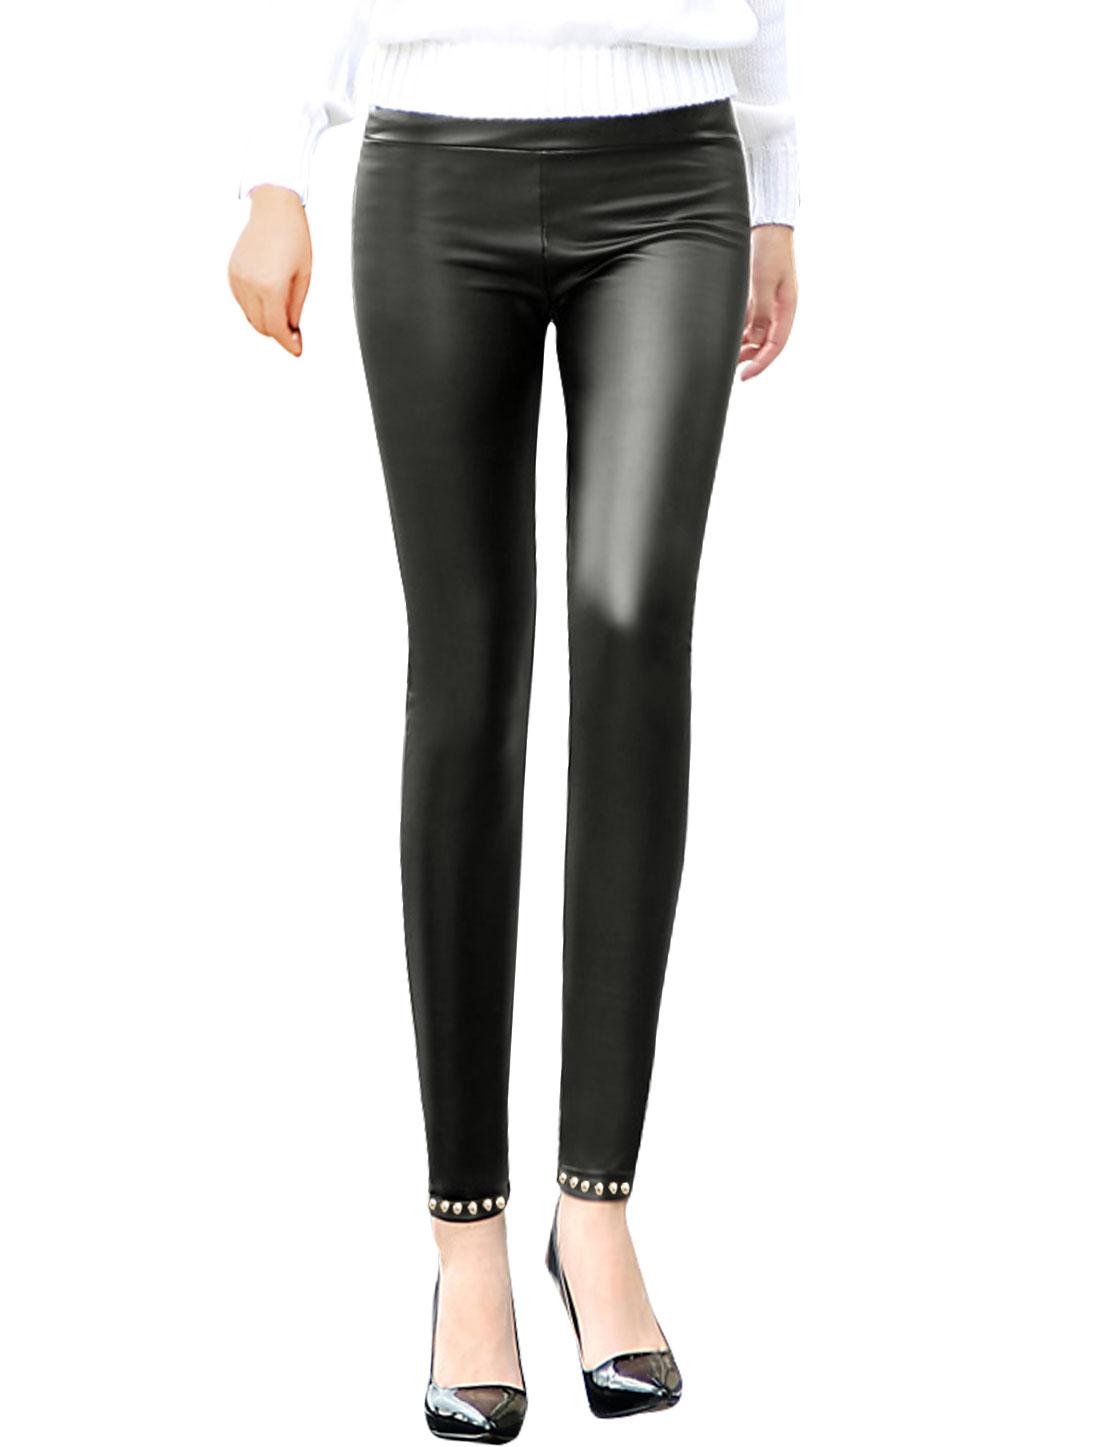 Women Elastic Waist Beads Decor Skinny PU Leggings Black XS